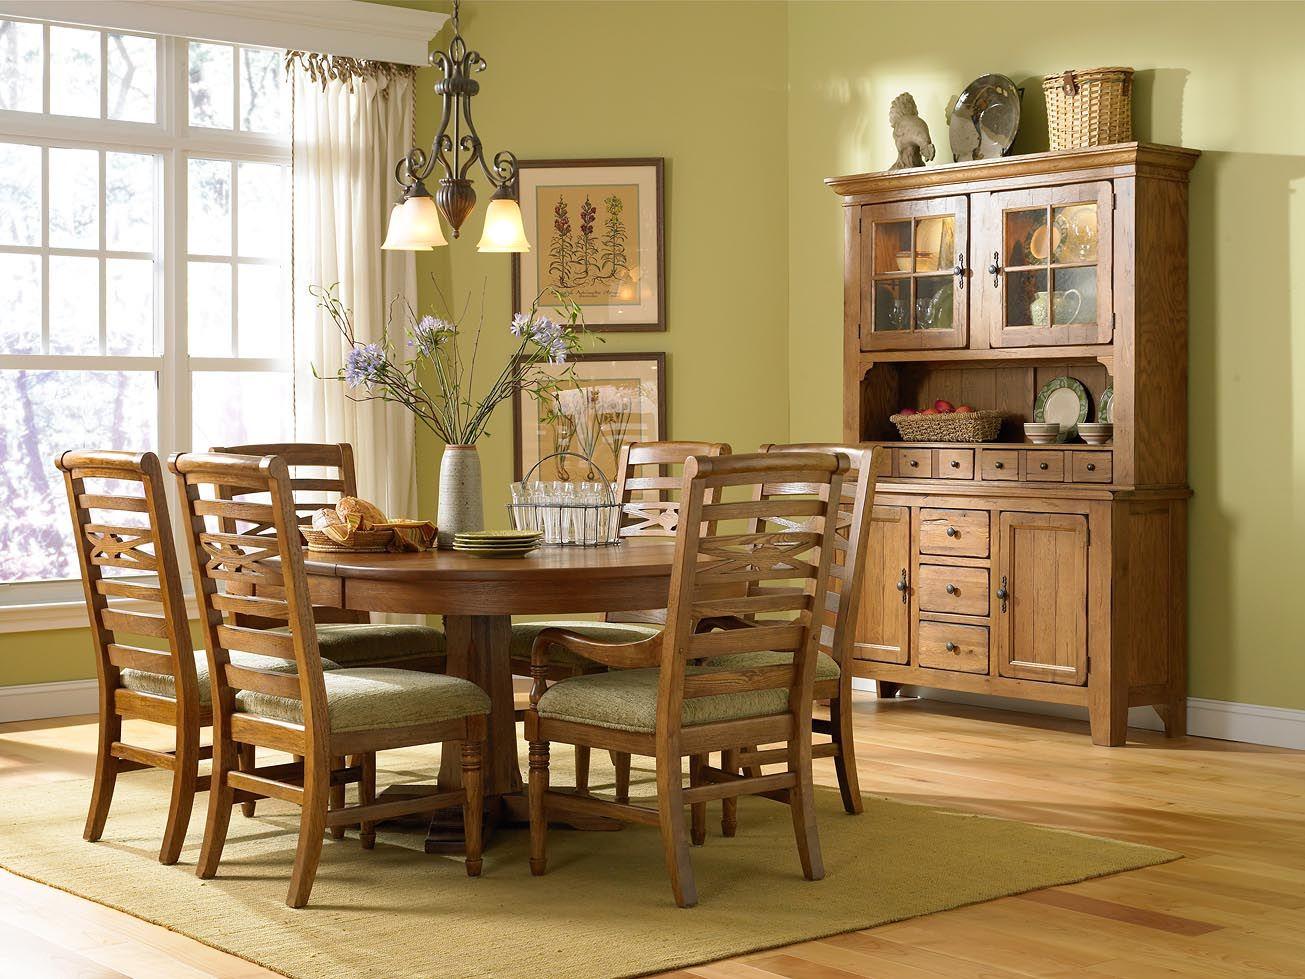 My Broyhill Attic Heirloom Dining Set Pedestool Table